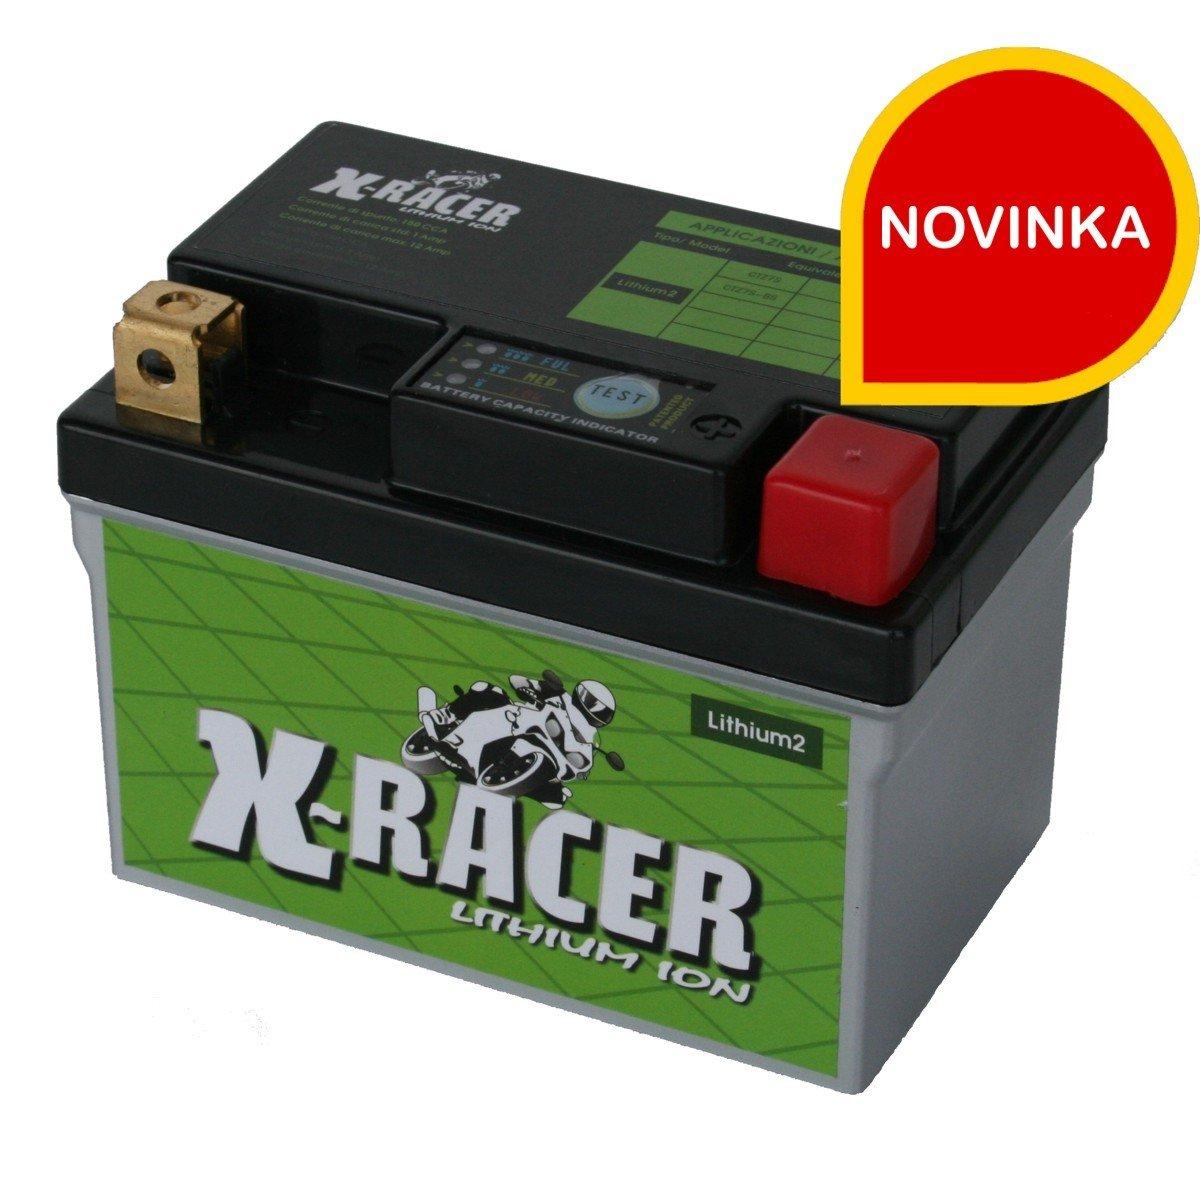 X-RACER Lithium2